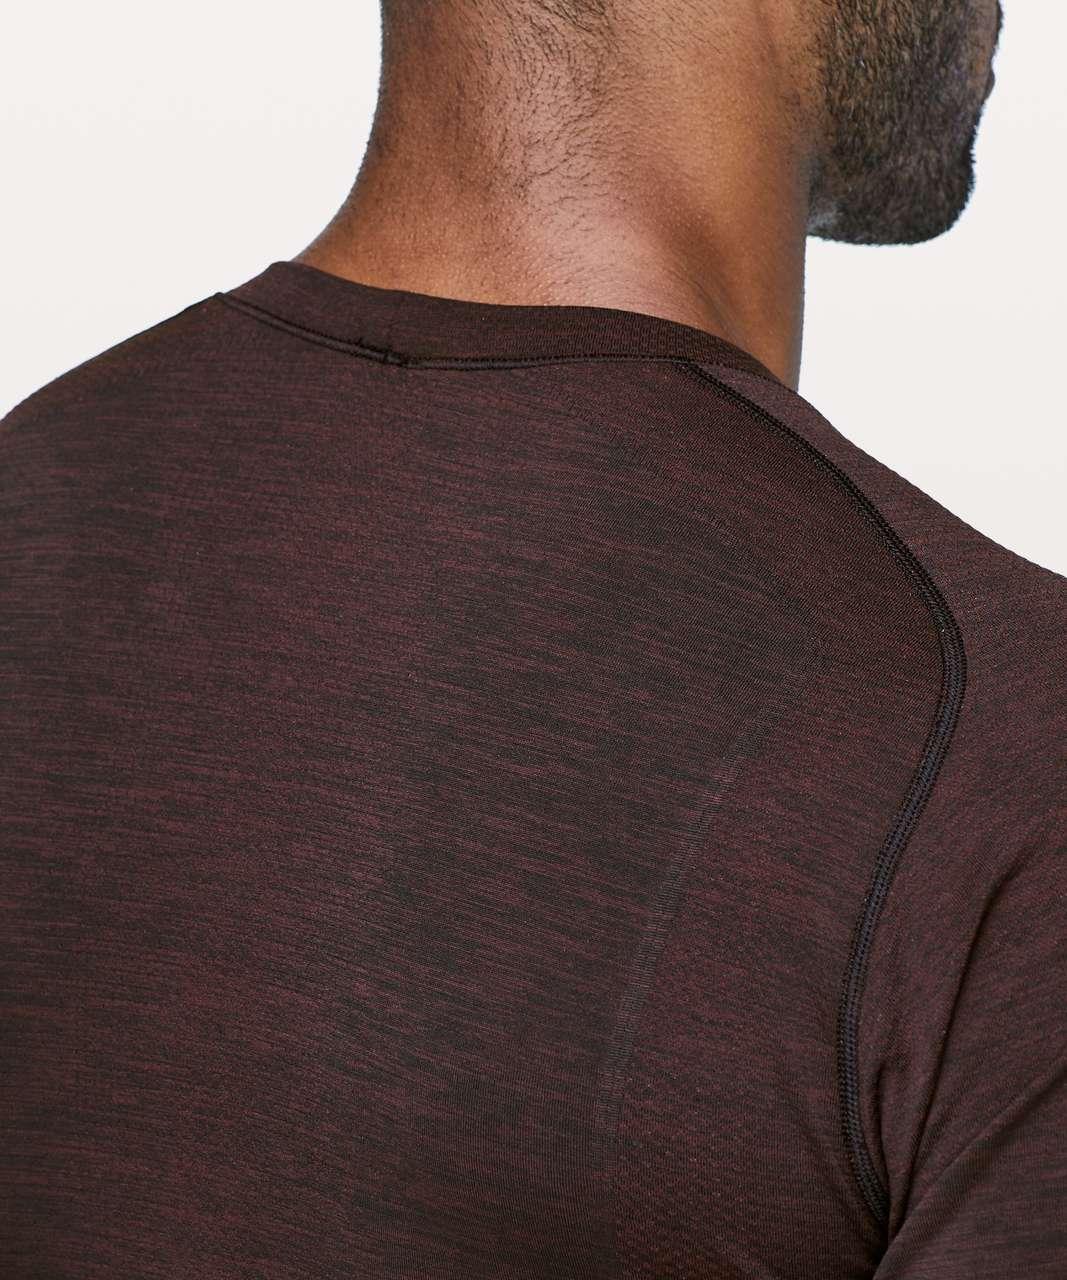 Lululemon Metal Vent Tech Short Sleeve - Cassis / Black